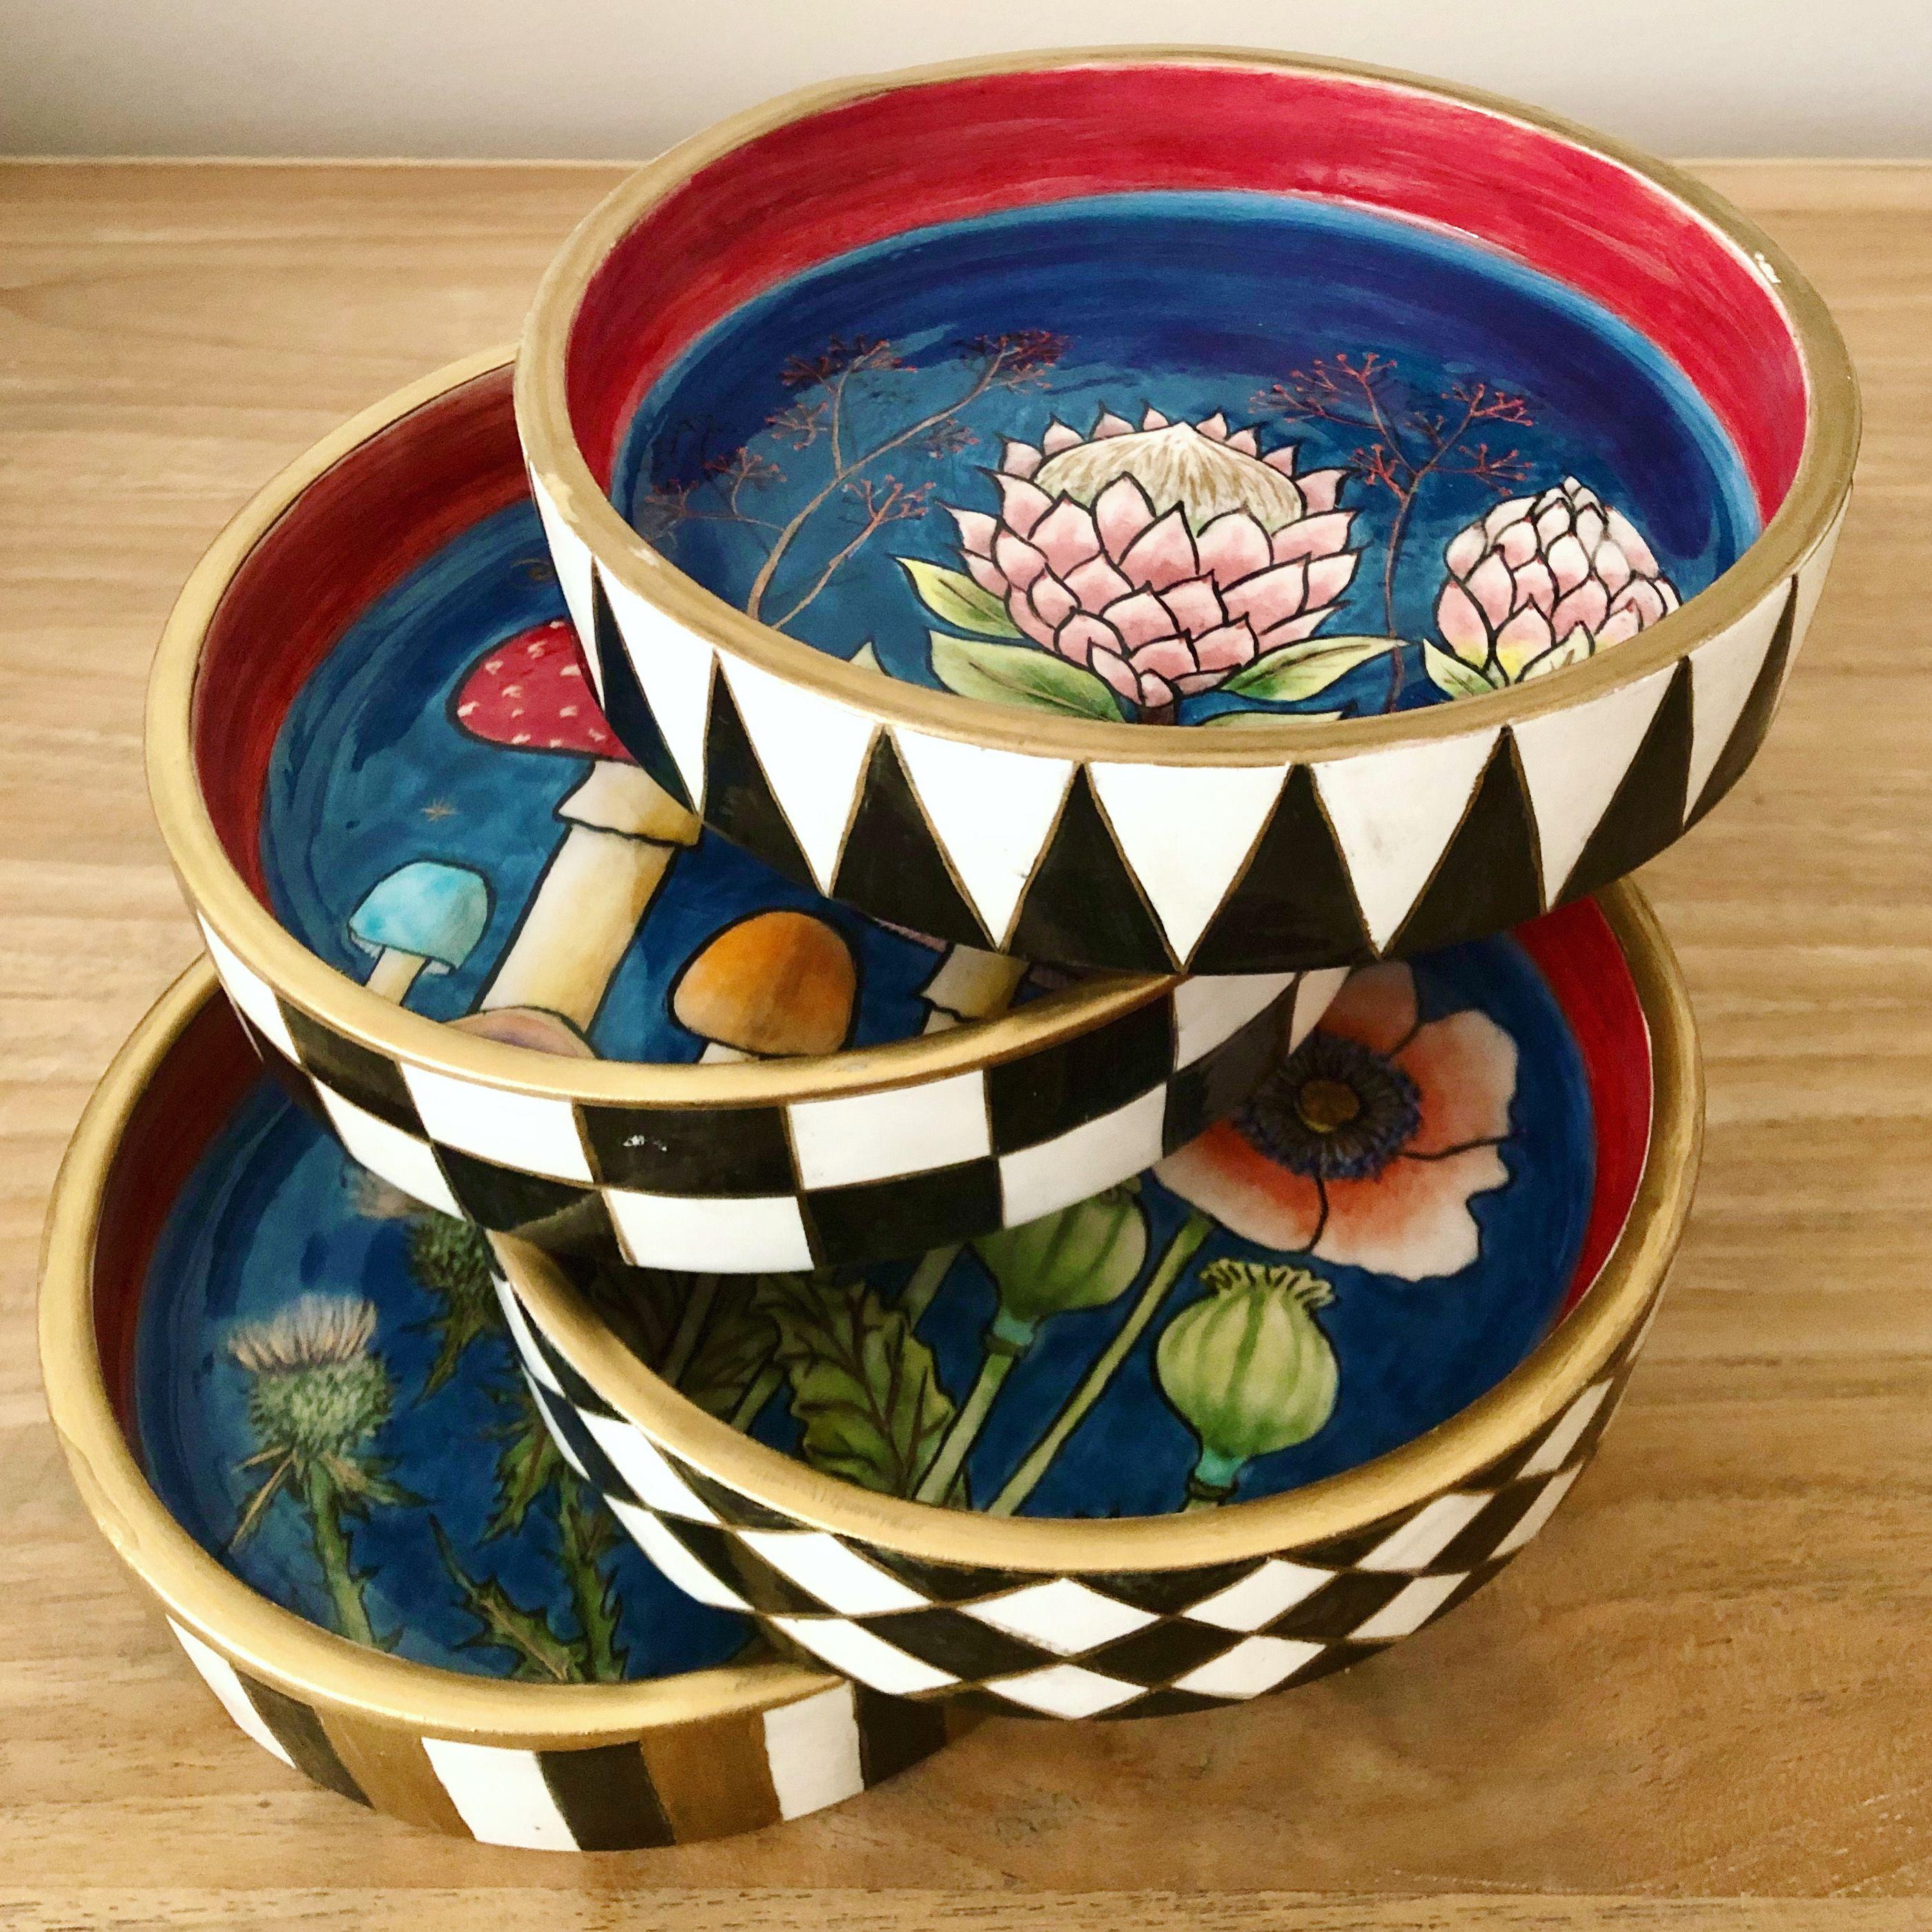 ceramic art, contemporary pottery design  #ceramicart #ceramics #pottery #çinitabak #çini #çinisanatı #potterydesign #handmade #mackenziechilds #mackenzie